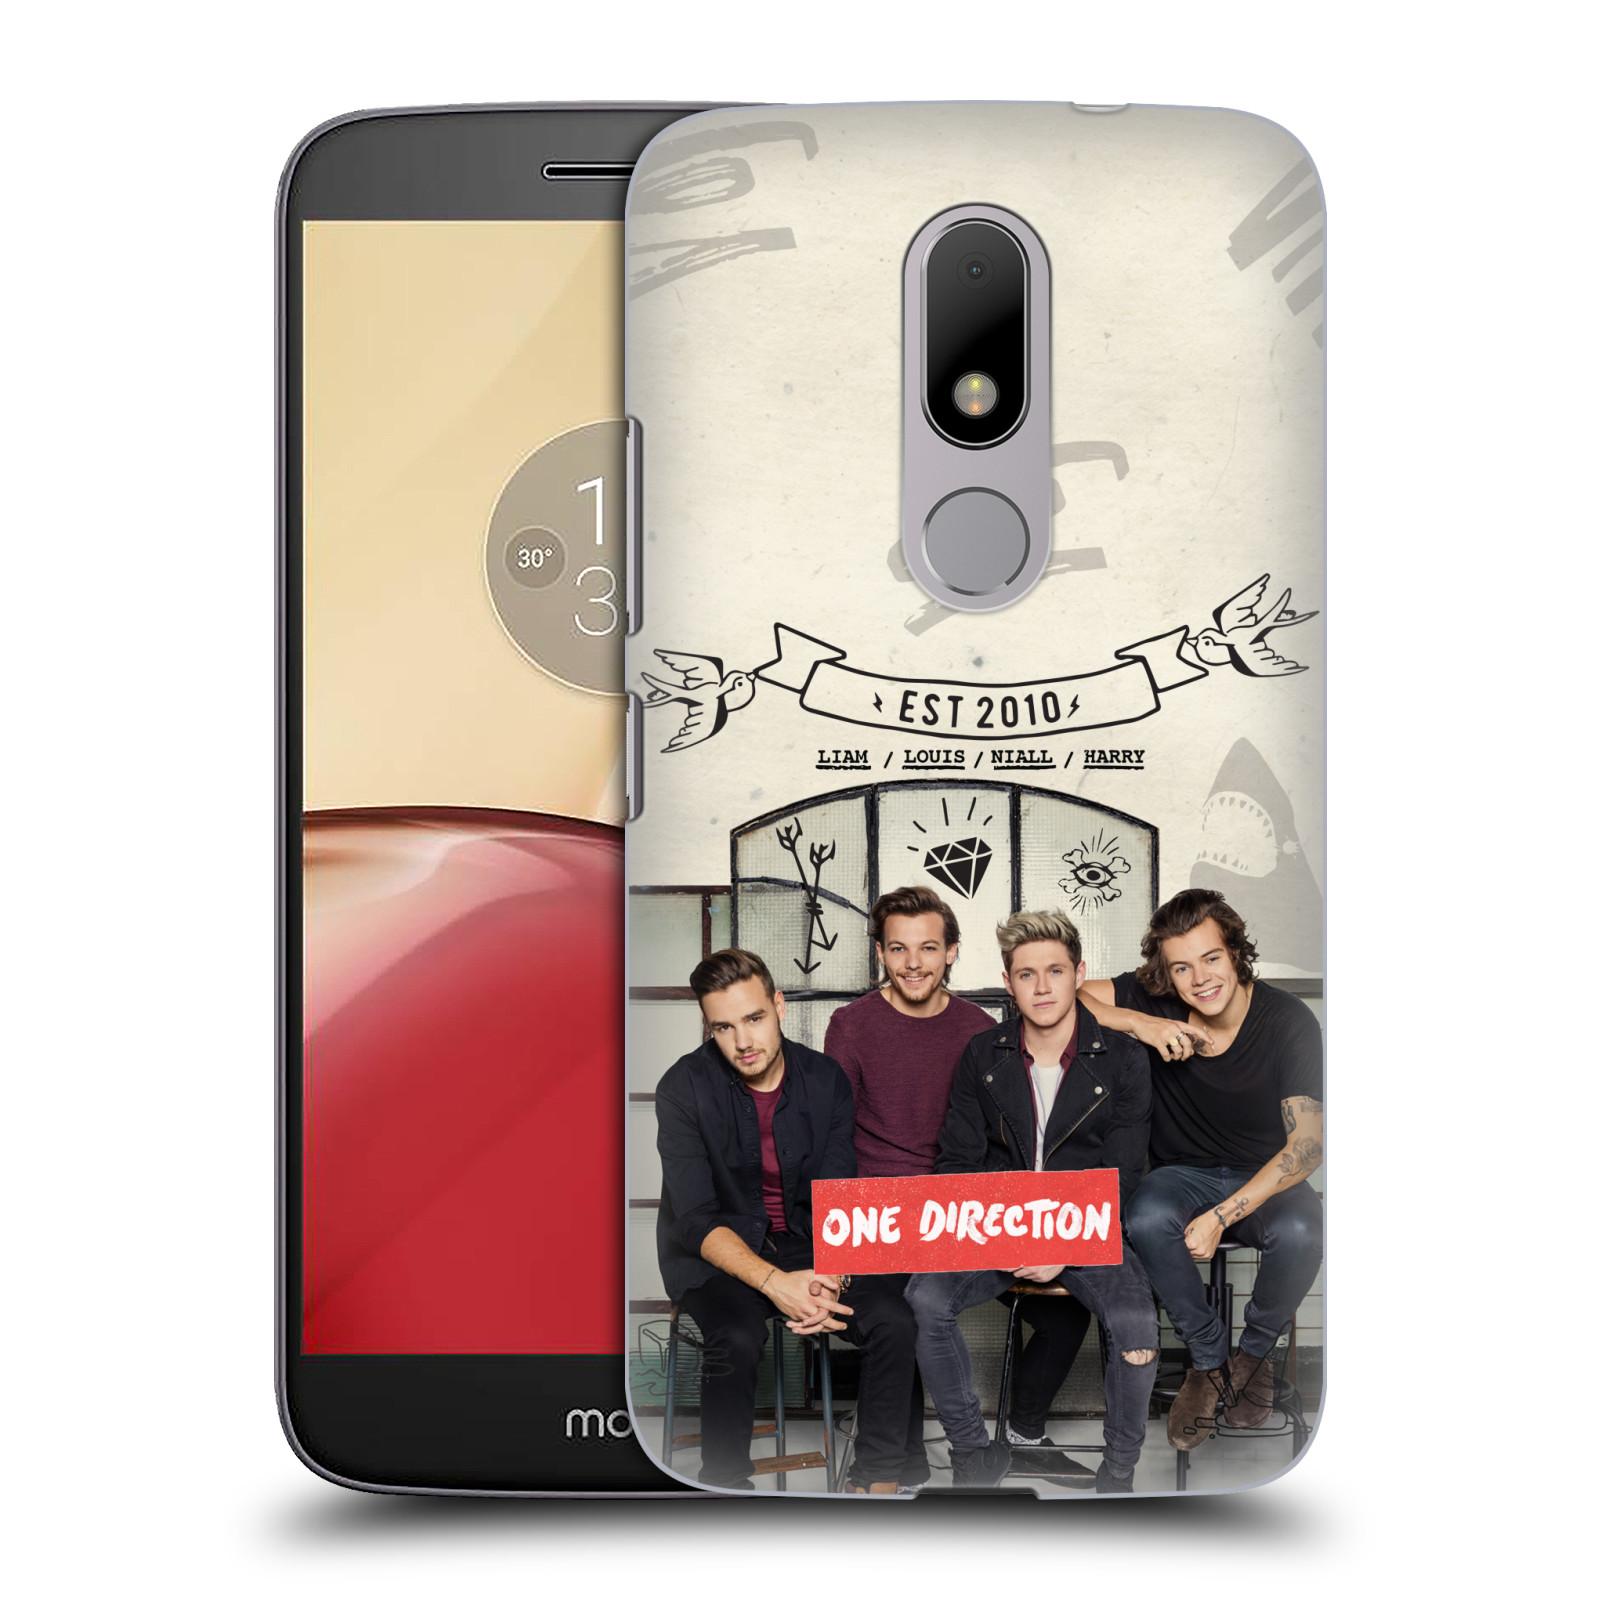 Plastové pouzdro na mobil Lenovo Moto M HEAD CASE One Direction - EST 2010 (Plastový kryt či obal One Direction Official na mobilní telefon Lenovo (Motorola) Moto M / Moto M Dual SIM)